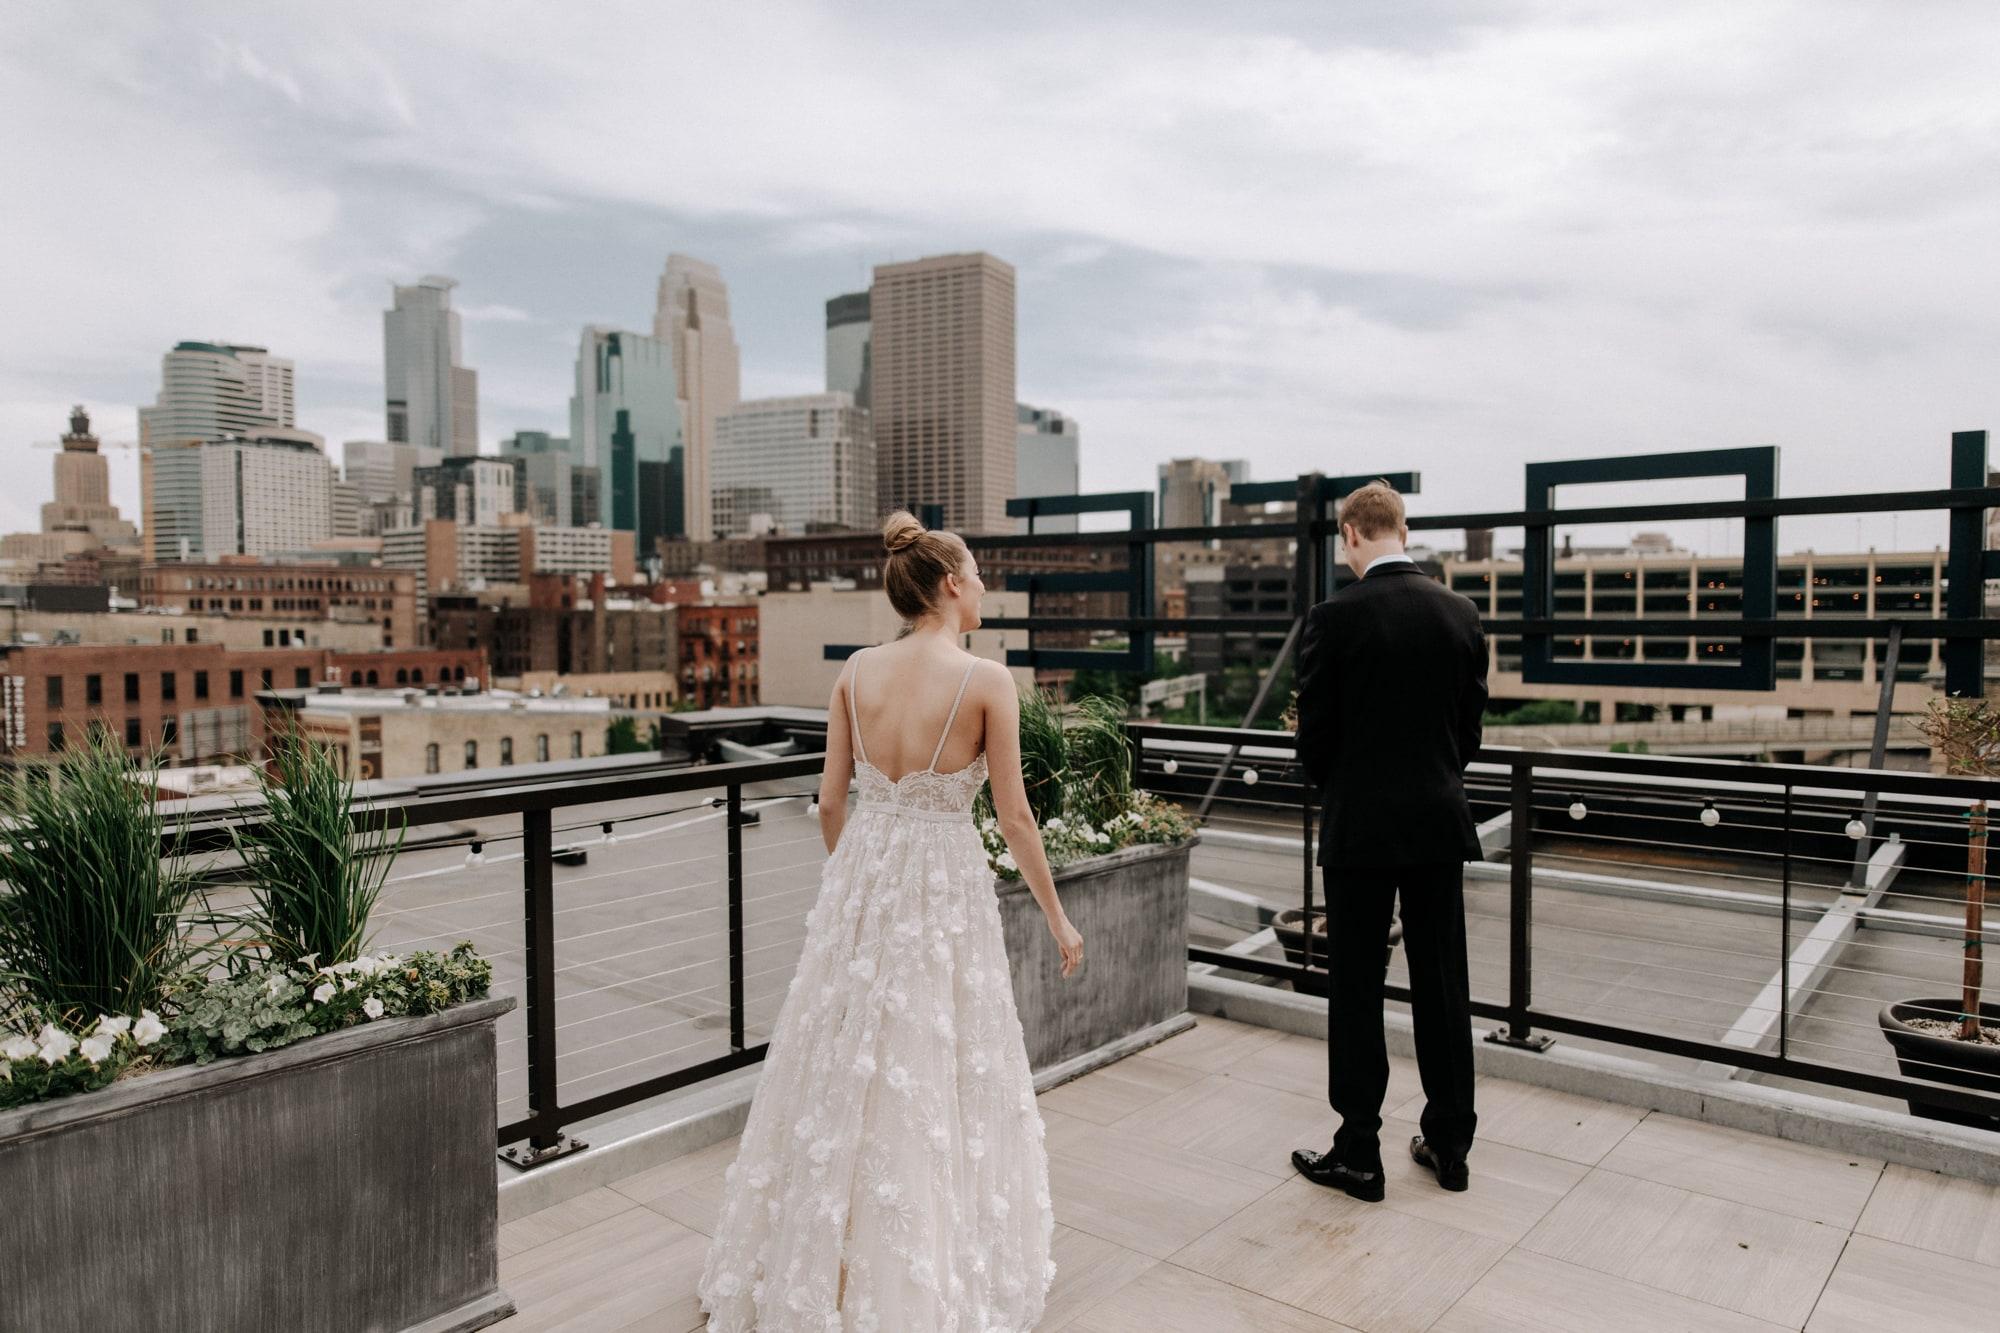 MIA-Minneapolis-Institute-Art-Summer-Wedding-_10.jpg